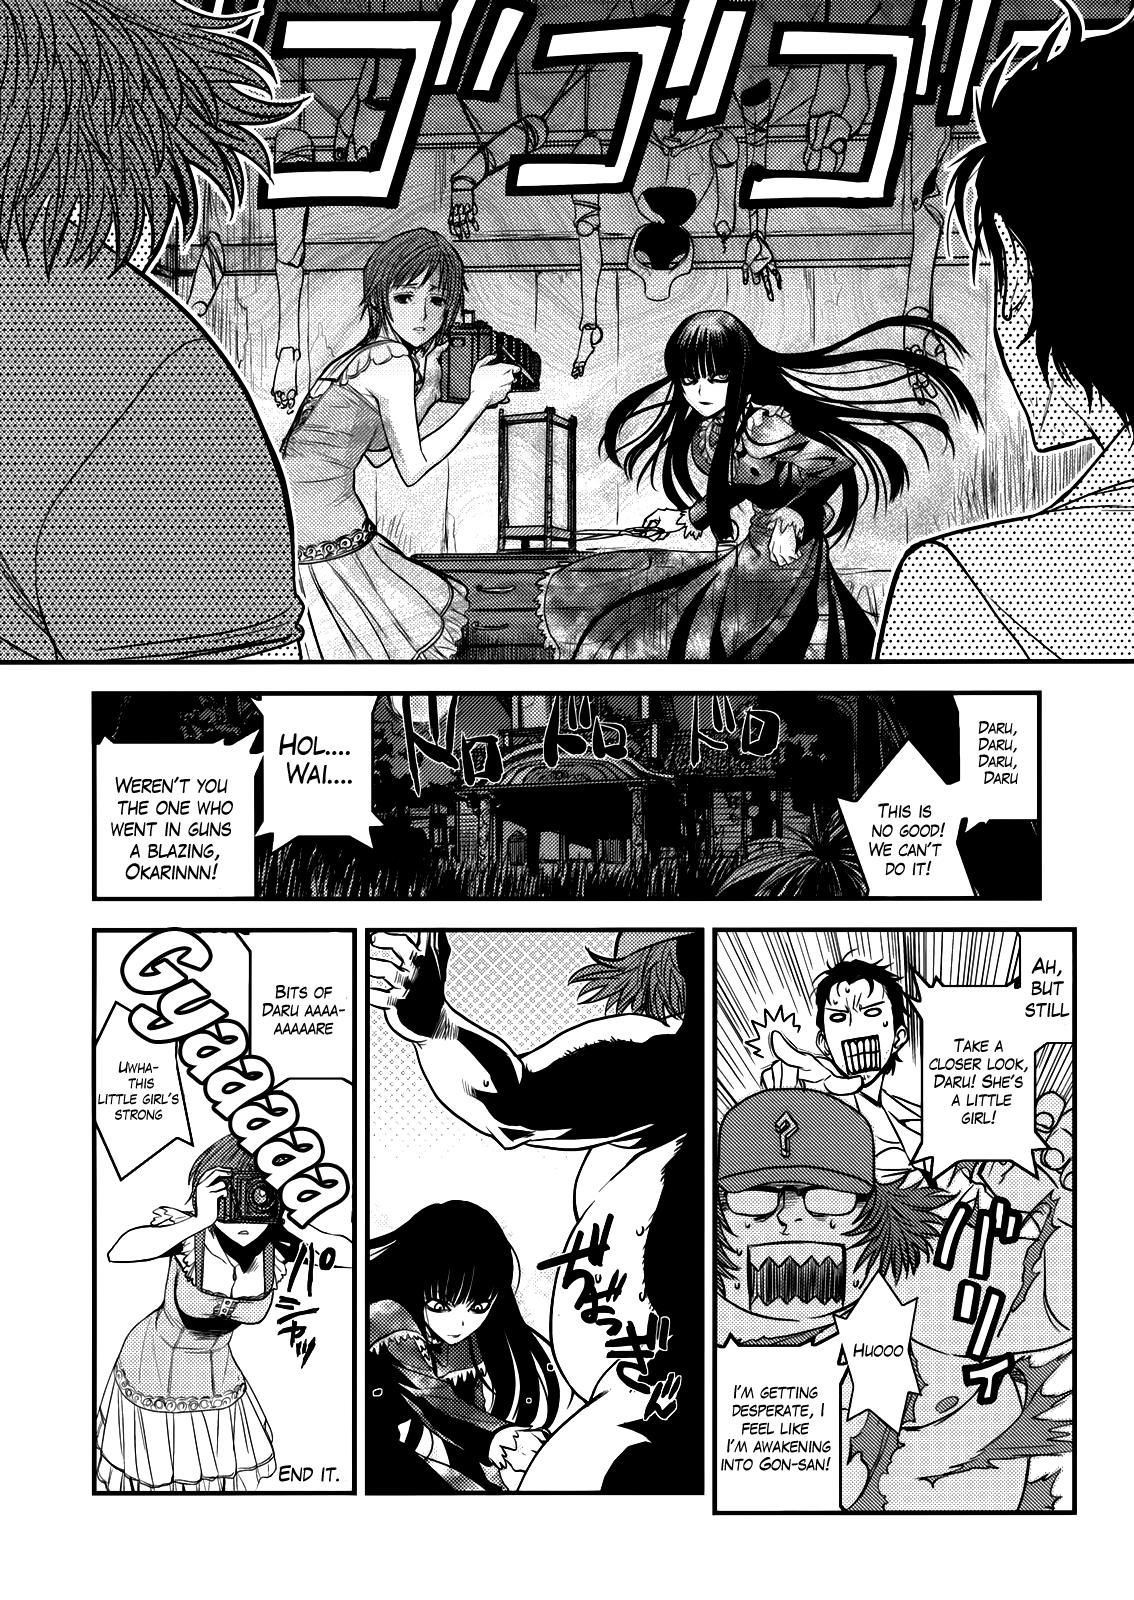 Hontou ni Atta Kowai Hanashi   It Really Was There! A Scary Story 22